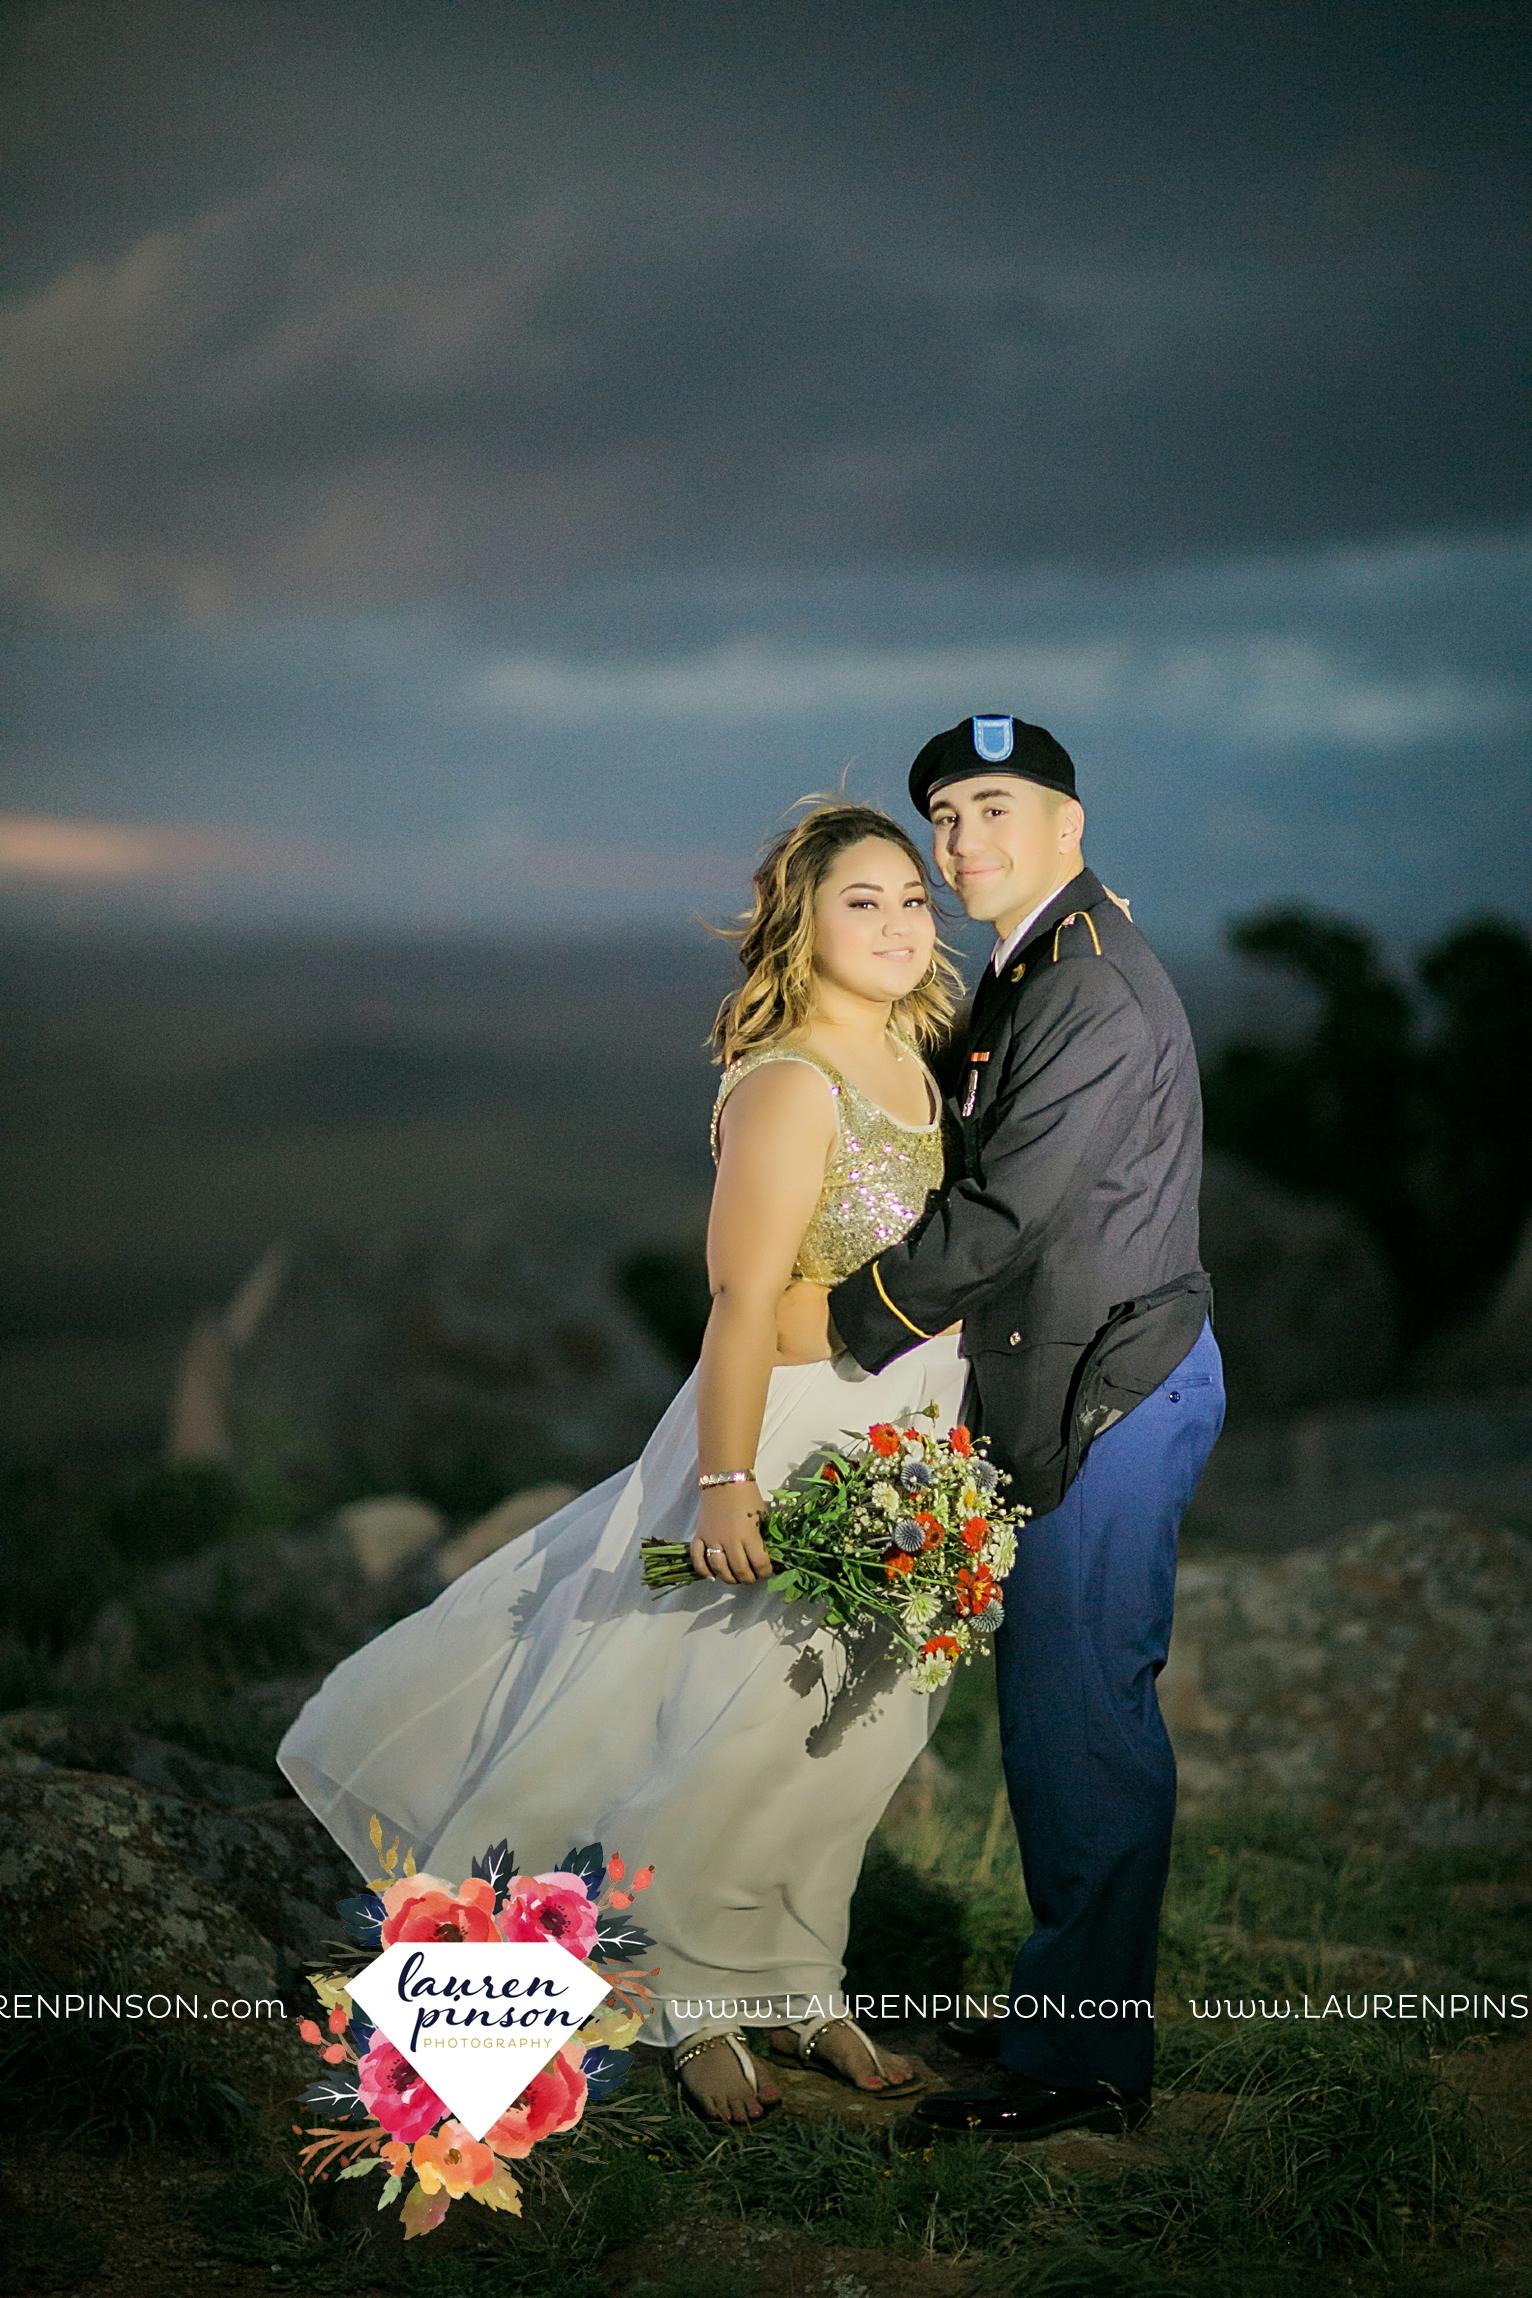 wichita-falls-texas-wedding-photography-engagement-session-army-fort-sill-lawton-oklahoma-wichita-mountains-newlyweds-00015.jpg